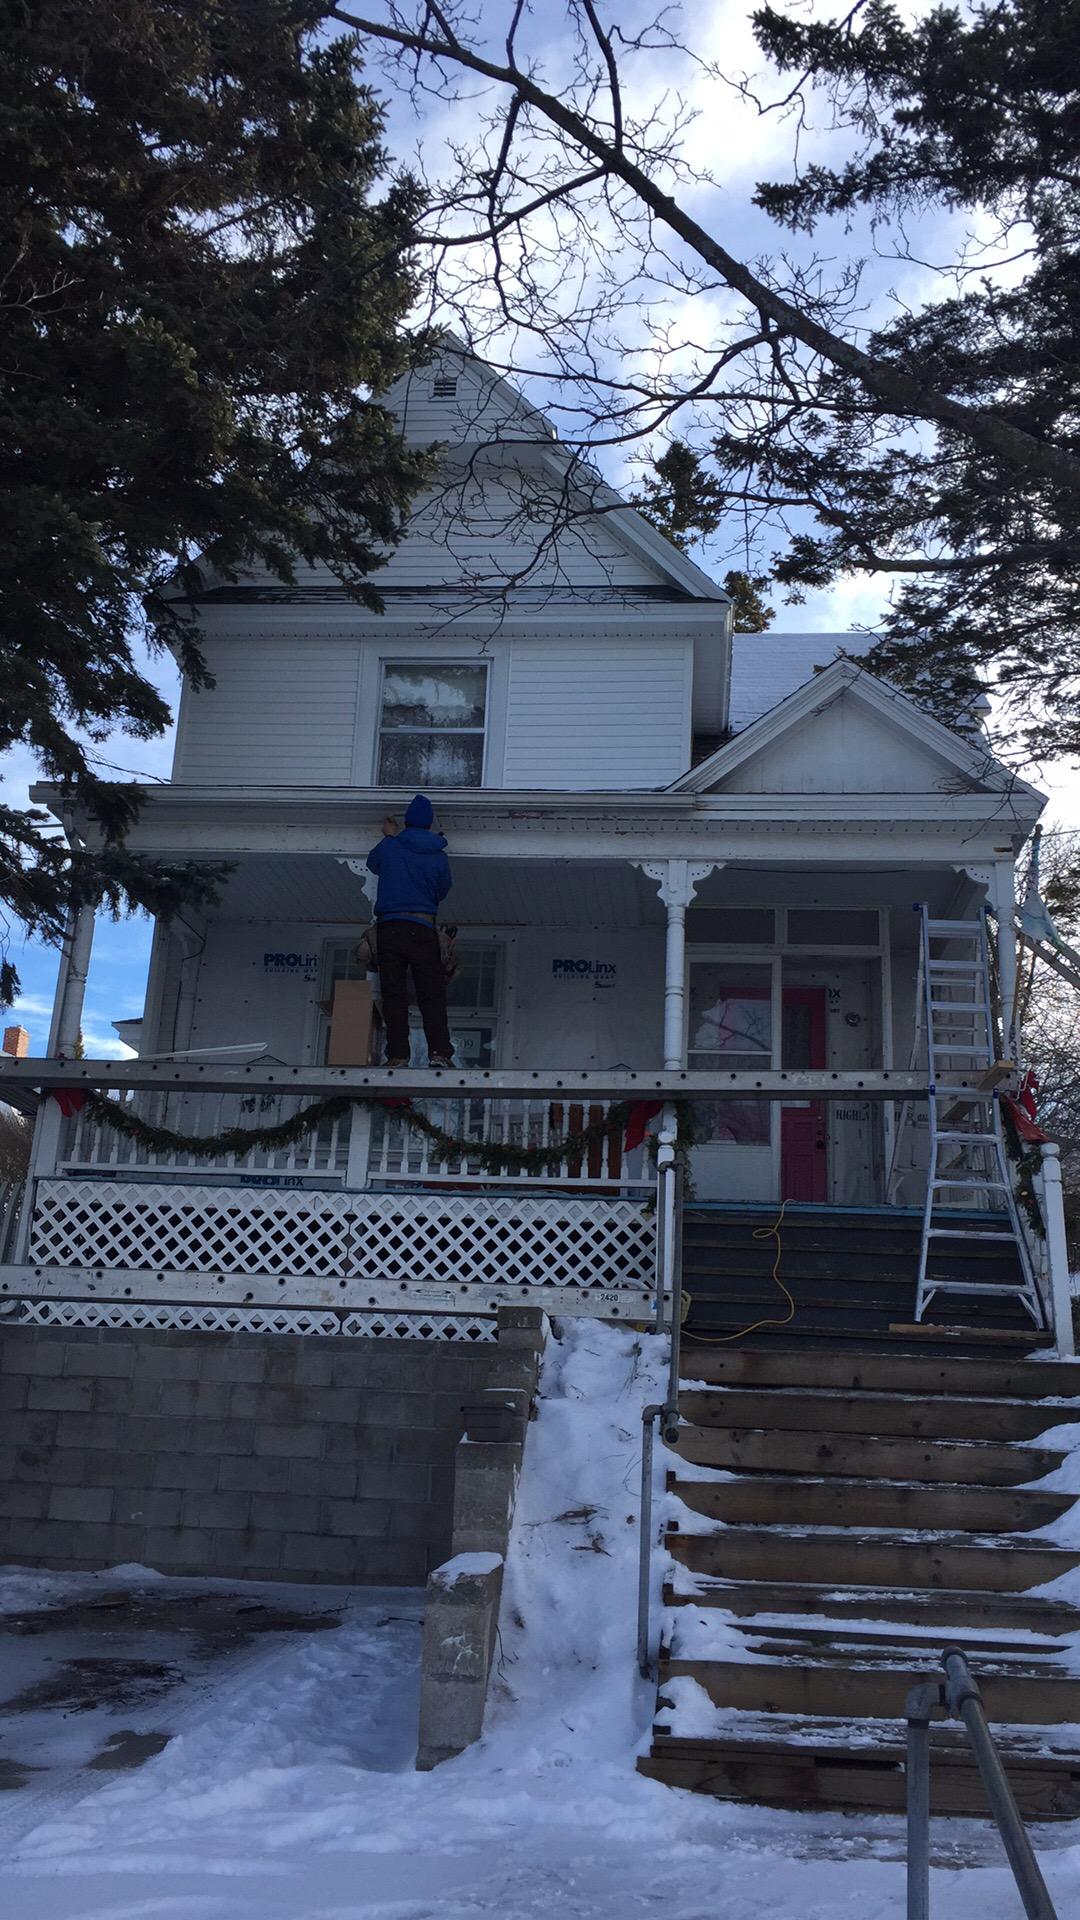 Barry's Total Home Maintenance & Repairs, LLC - Petoskey, MI 49770 - (231)373-6009 | ShowMeLocal.com